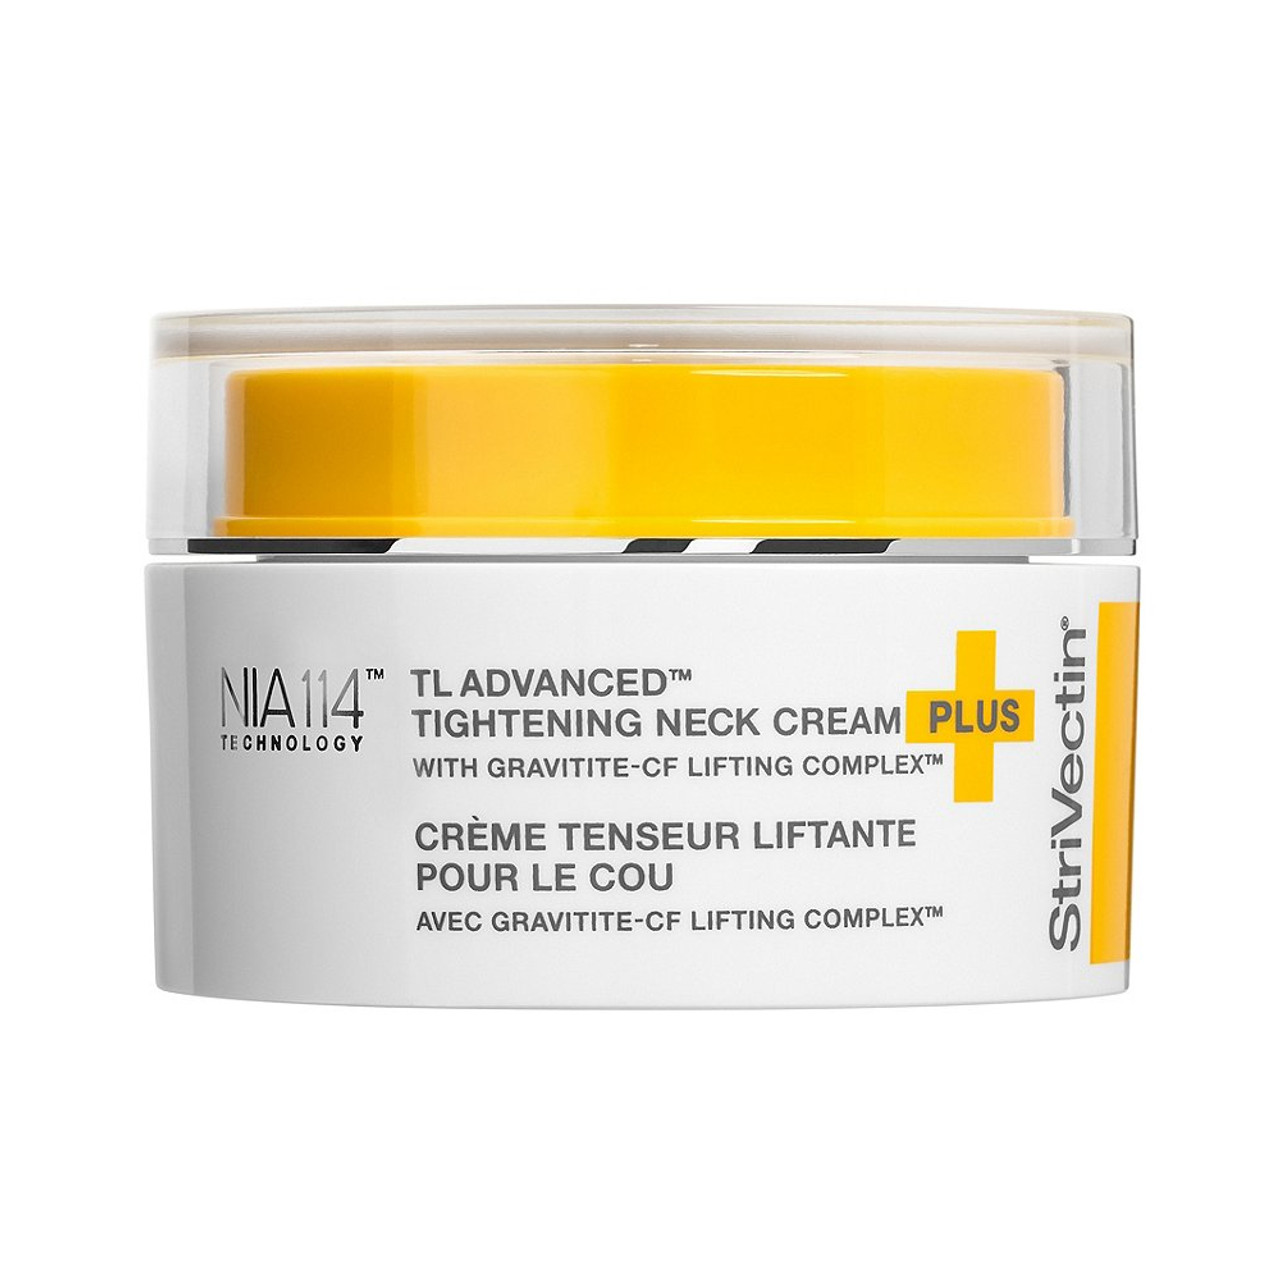 StriVectin-TL Advanced Tightening Neck Cream PLUS BeautifiedYou.com